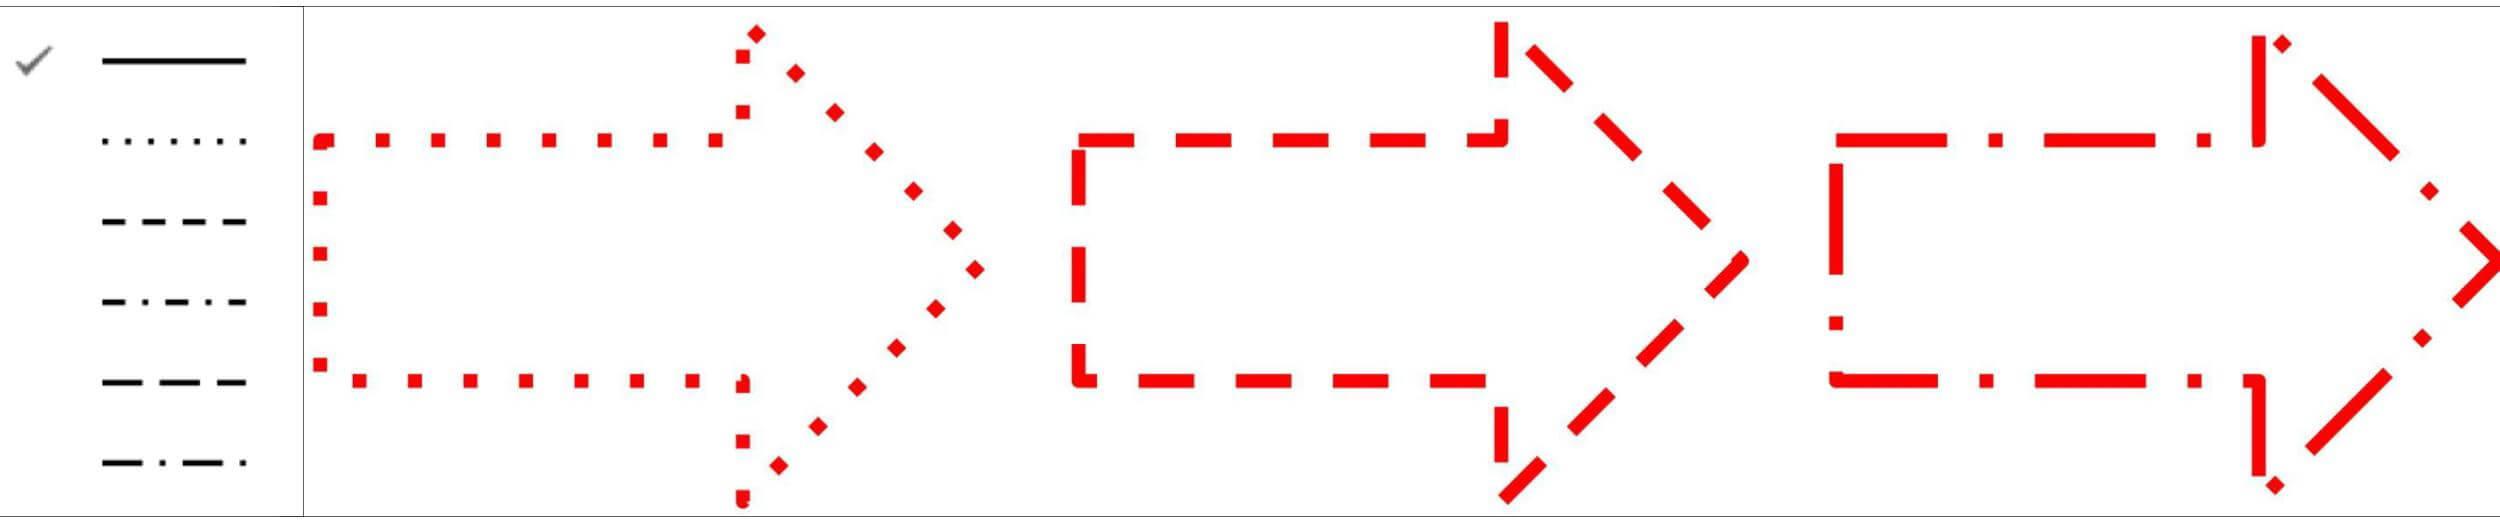 Google図形描画 破線の枠線のパターン